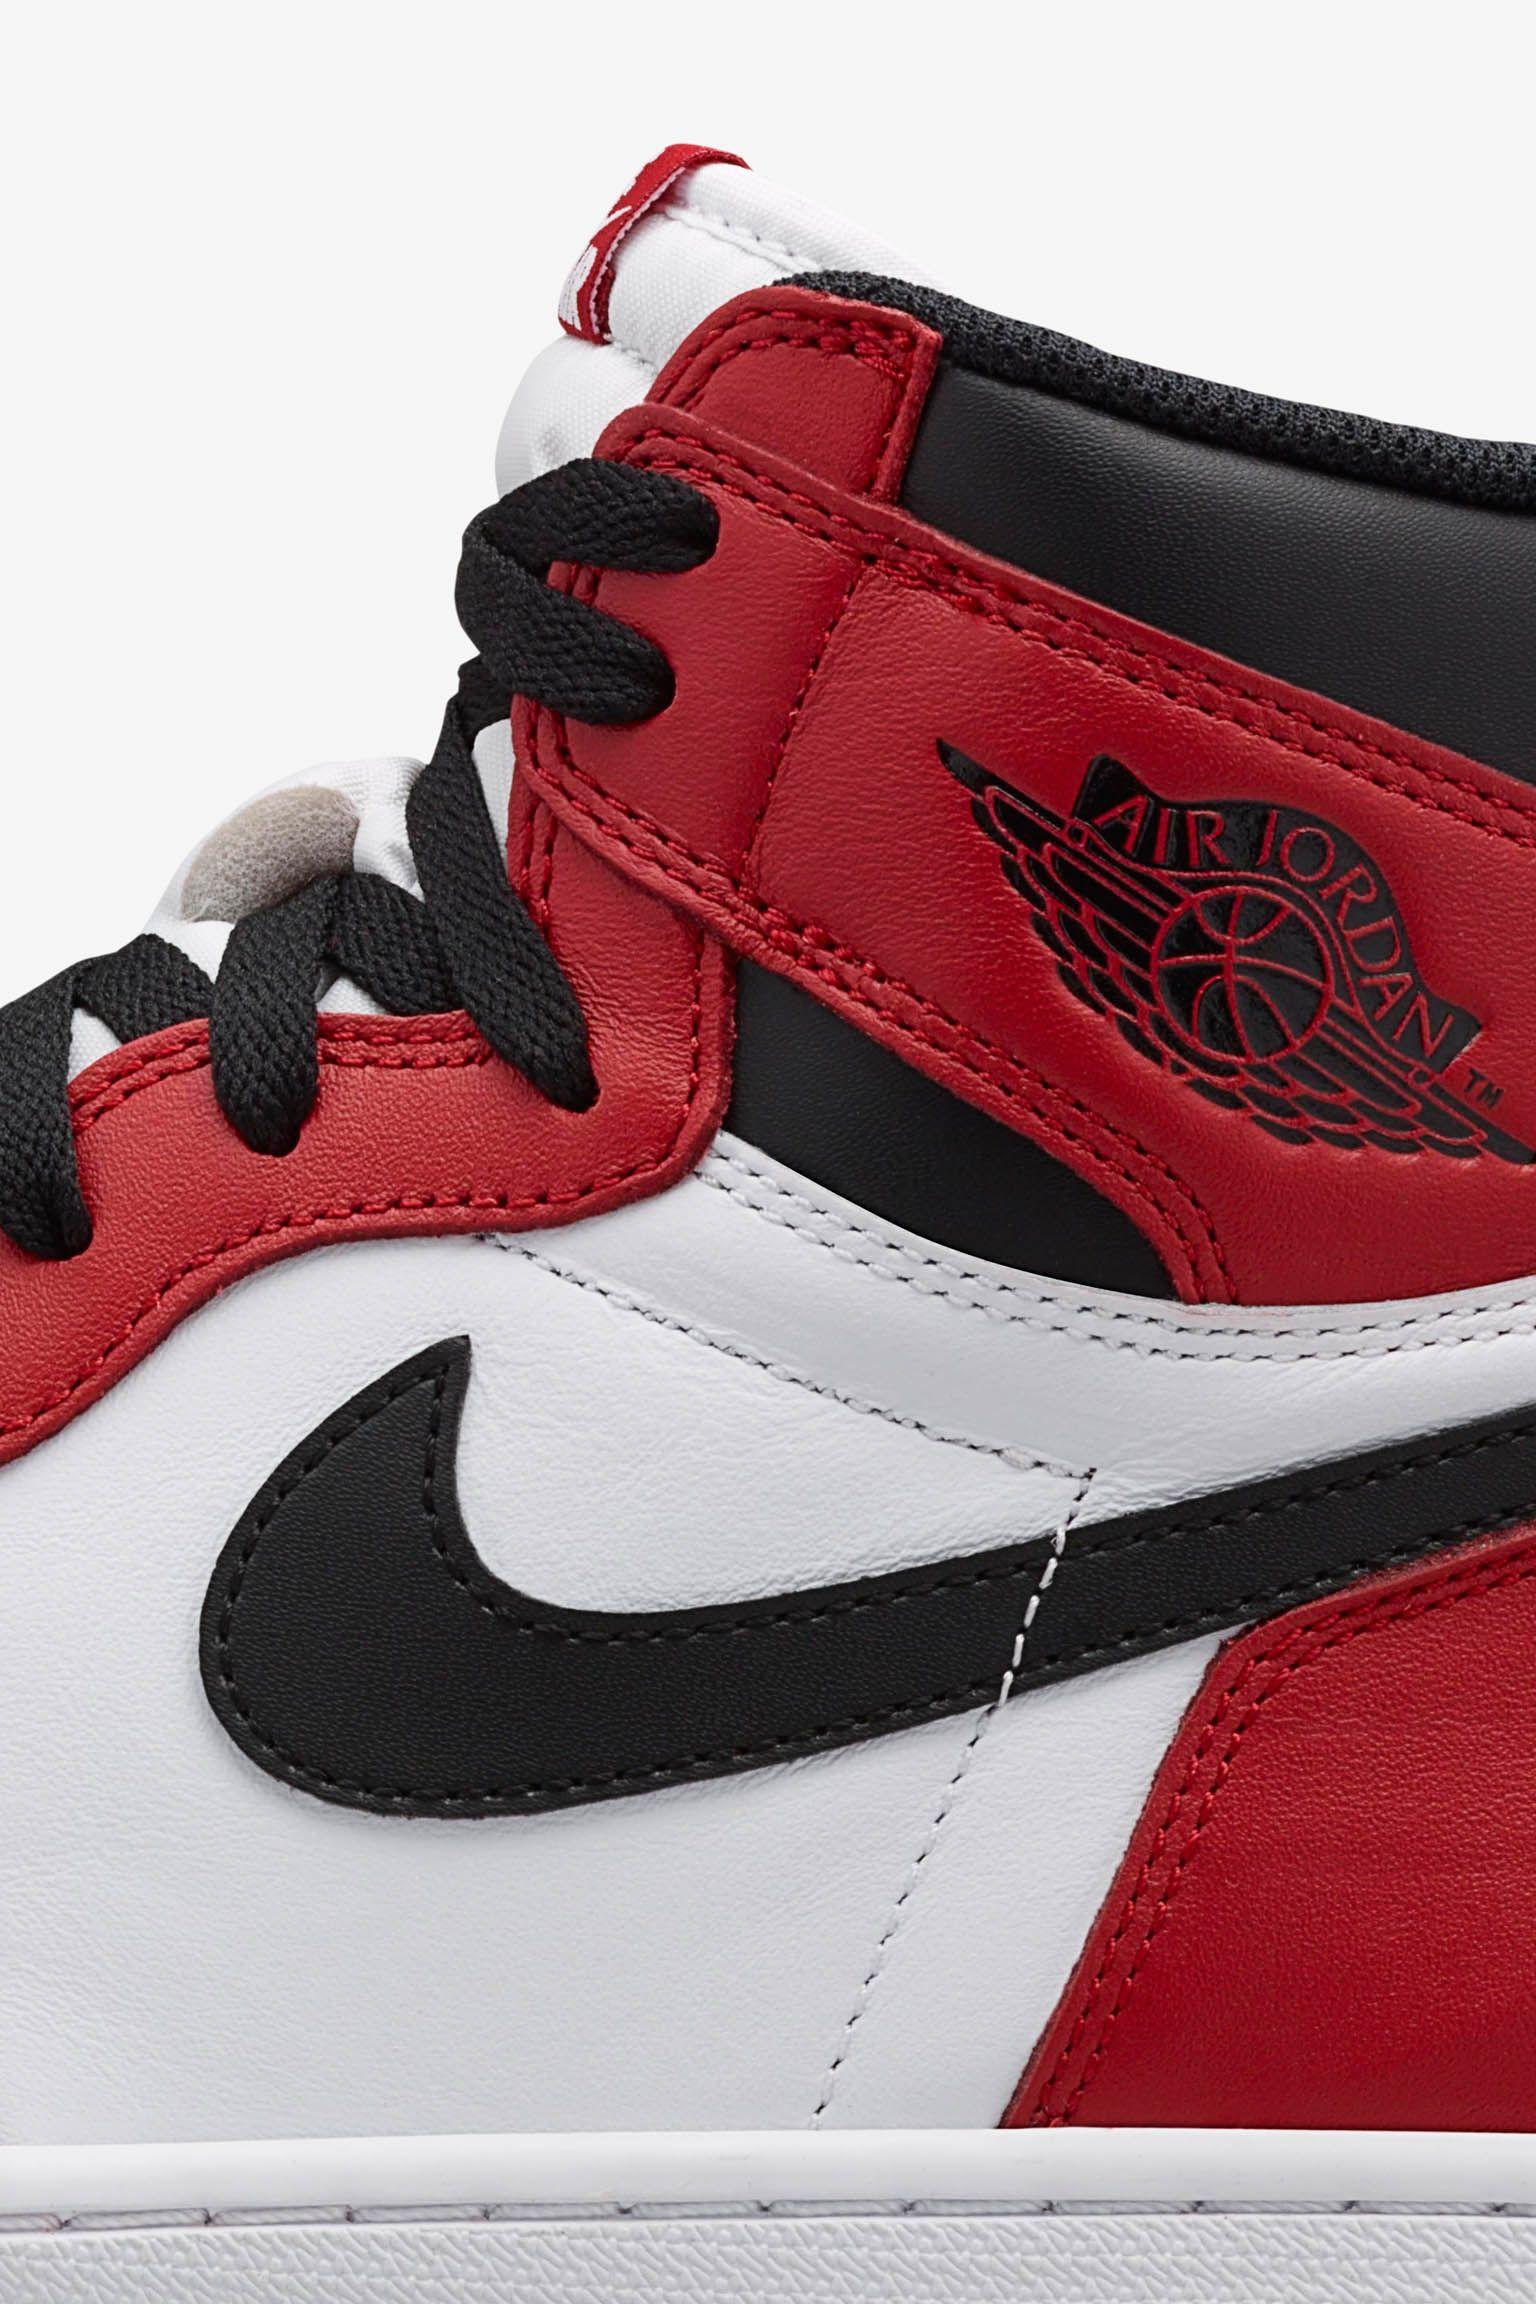 Air Jordan 1 Retro 'Chicago' Release Date. Nike SNKRS